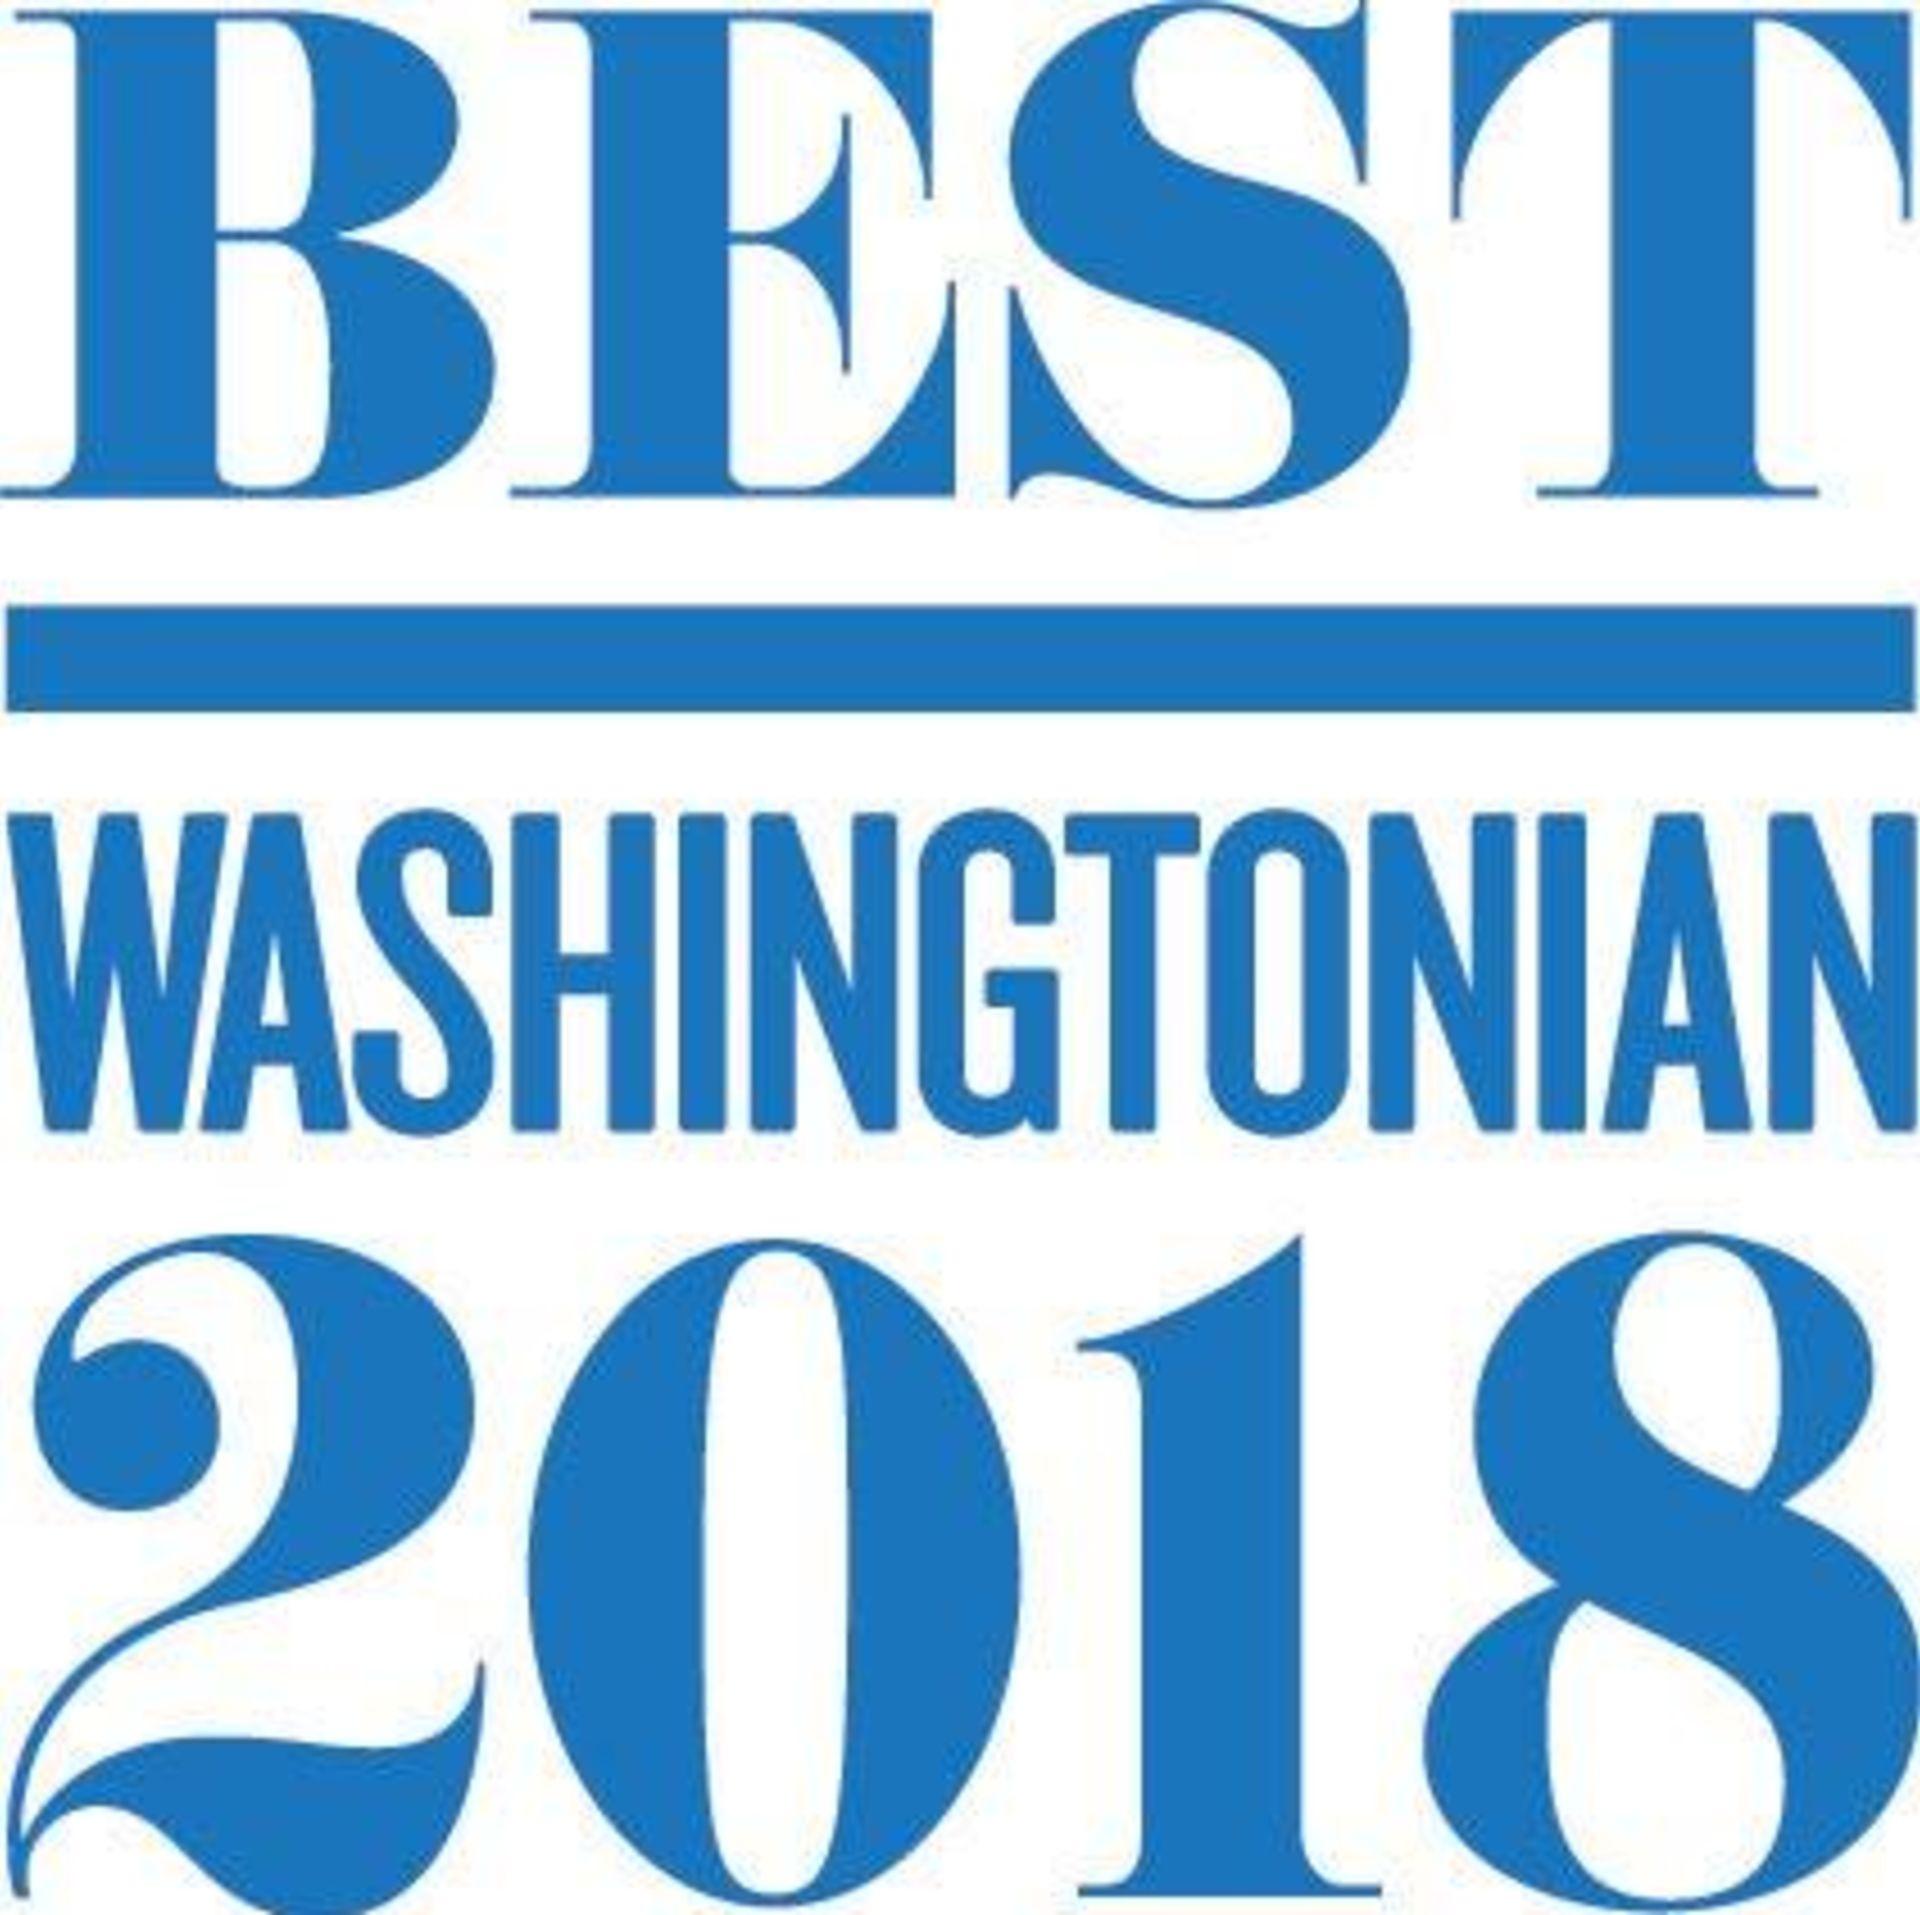 Washingtonian Best 2018